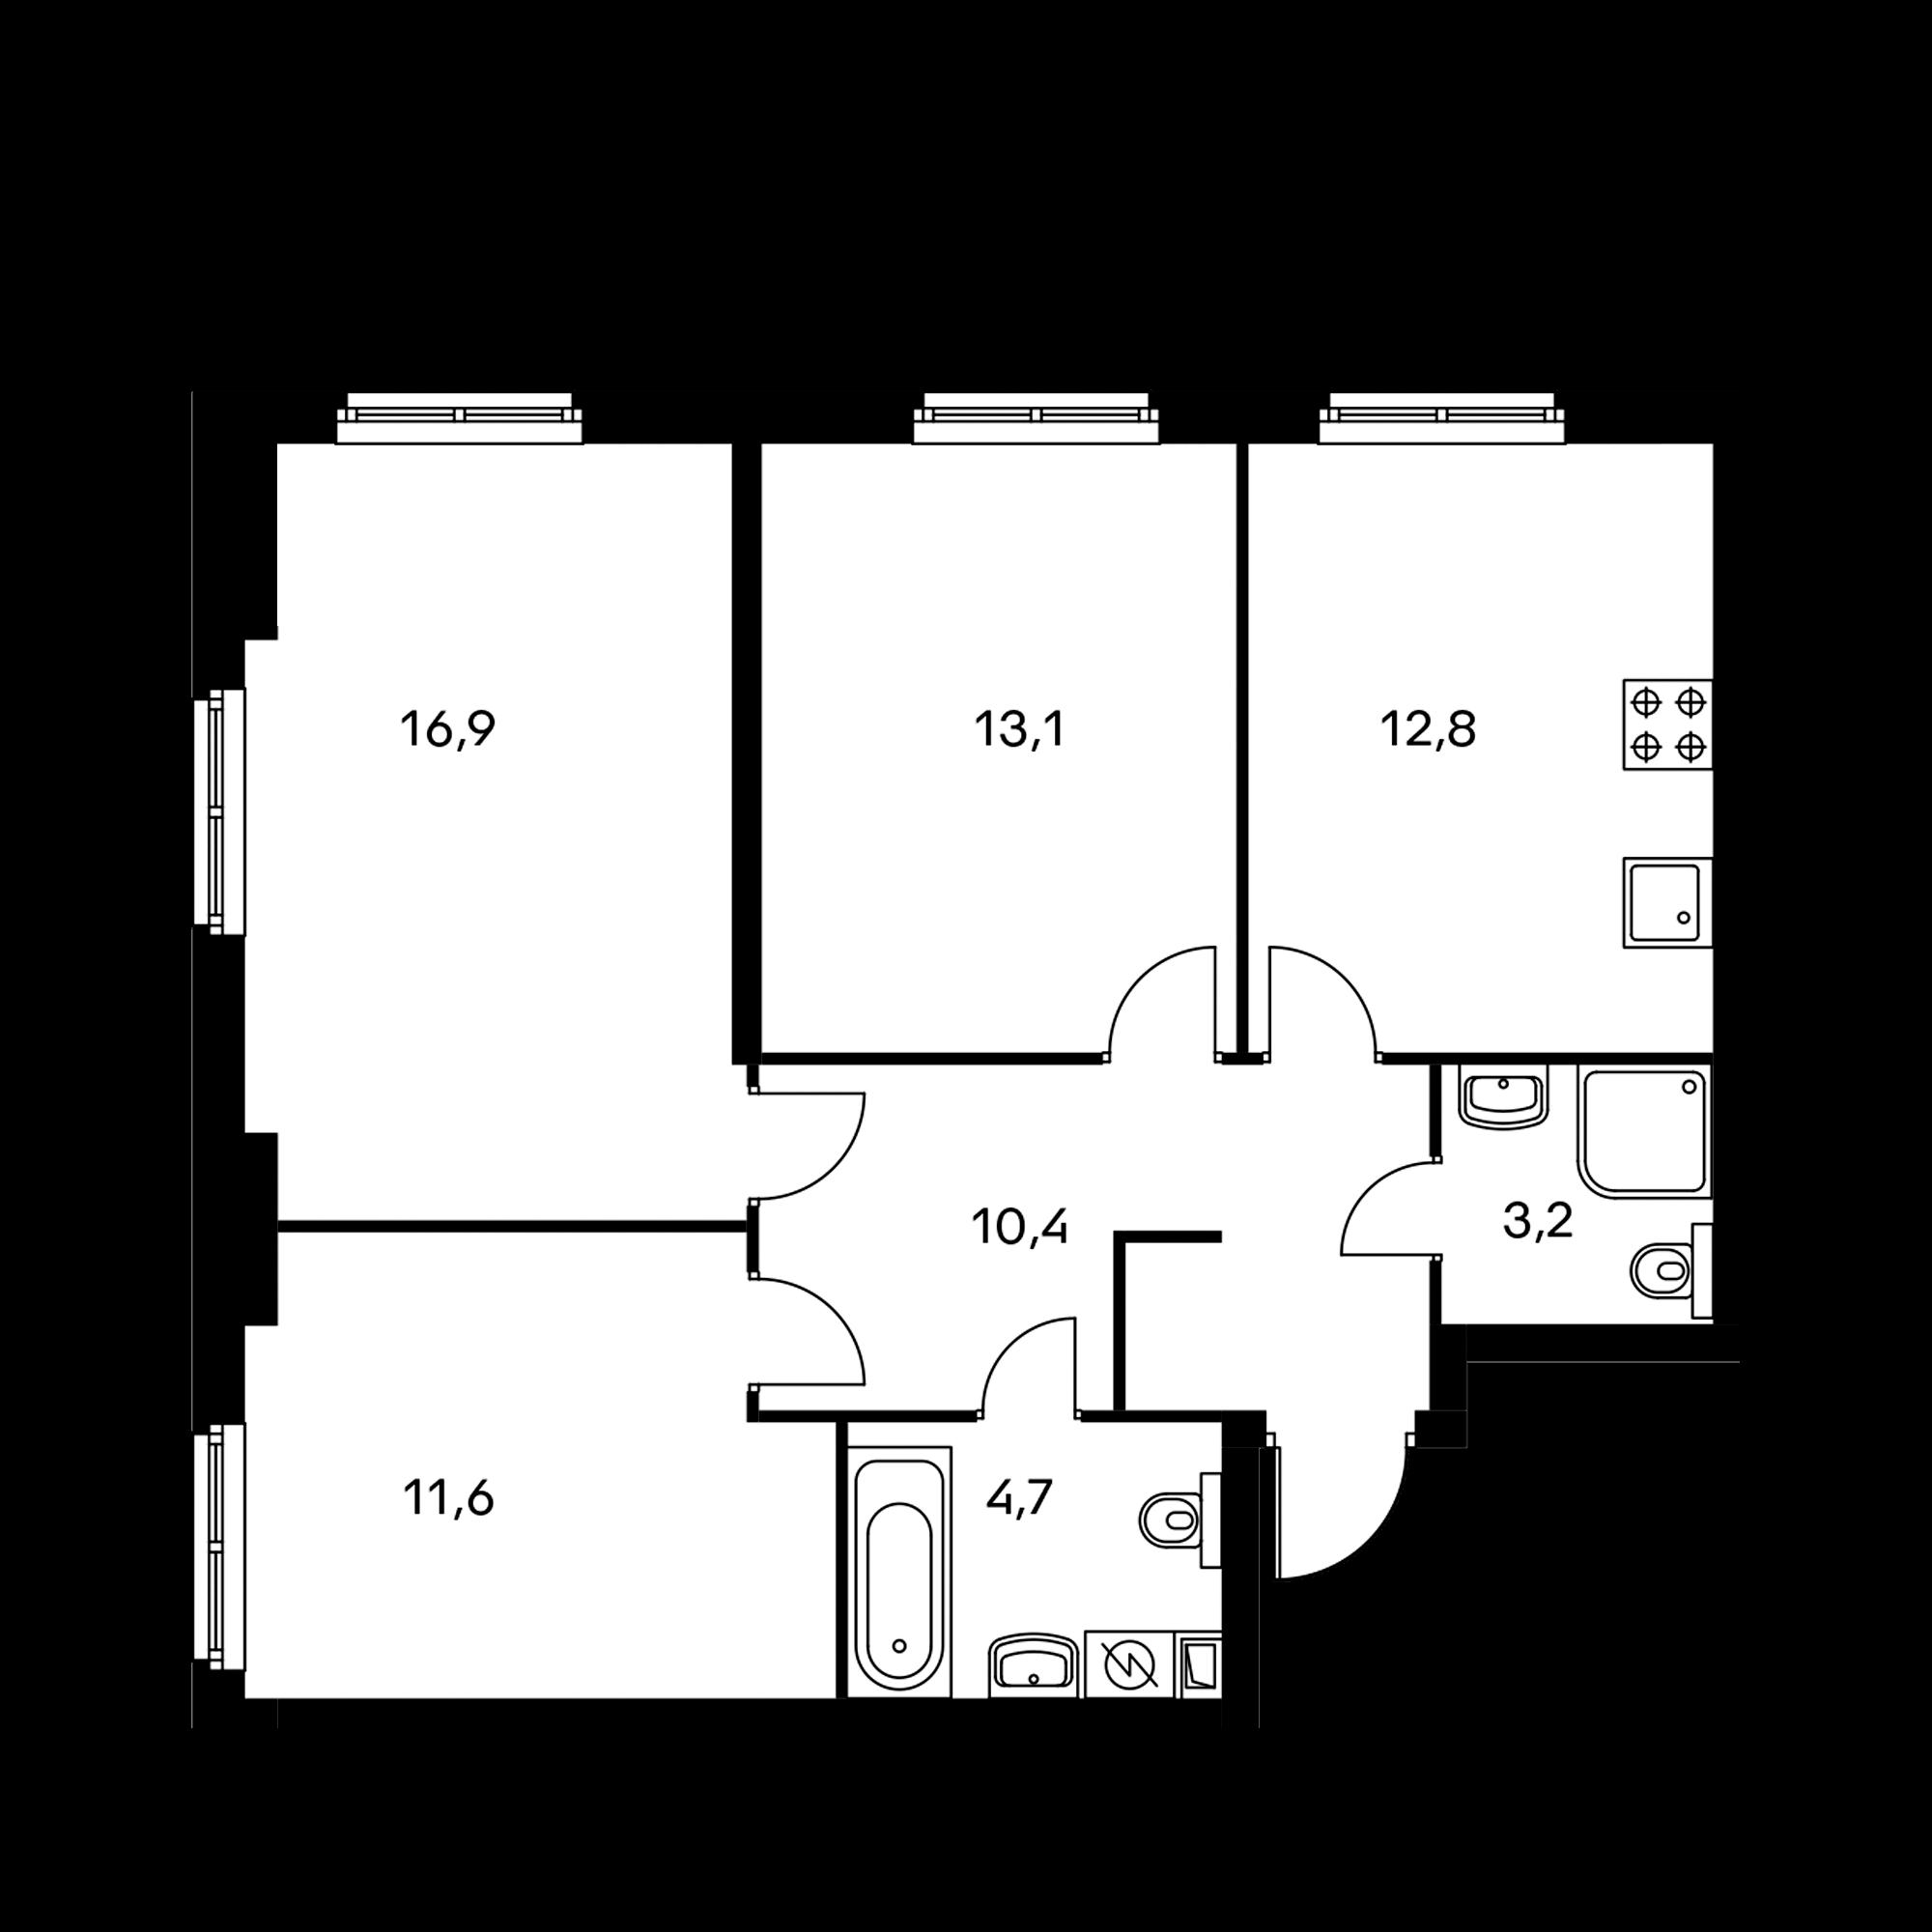 3KM1_10.2